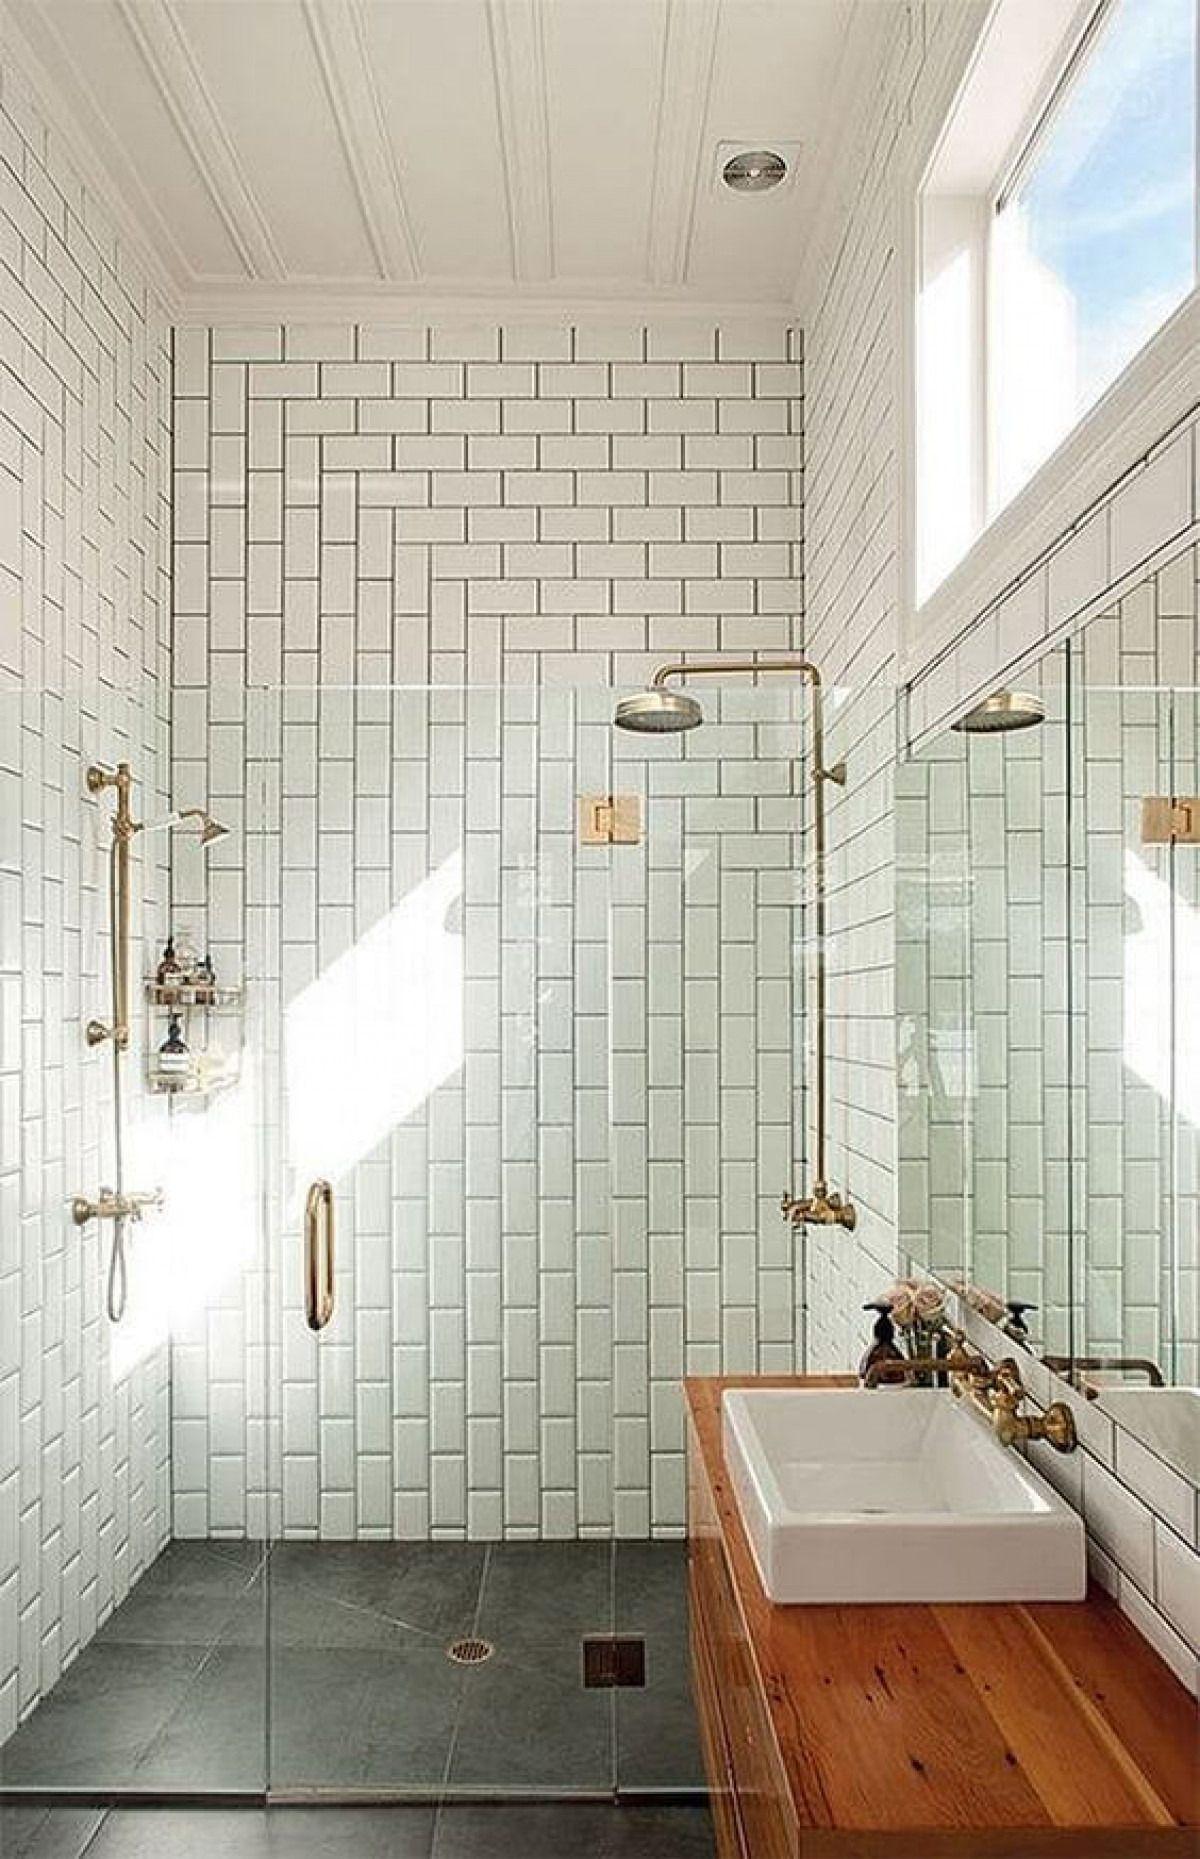 Walk In Shower Enclosure Ideas 2021 | Bathroom inspiration ...